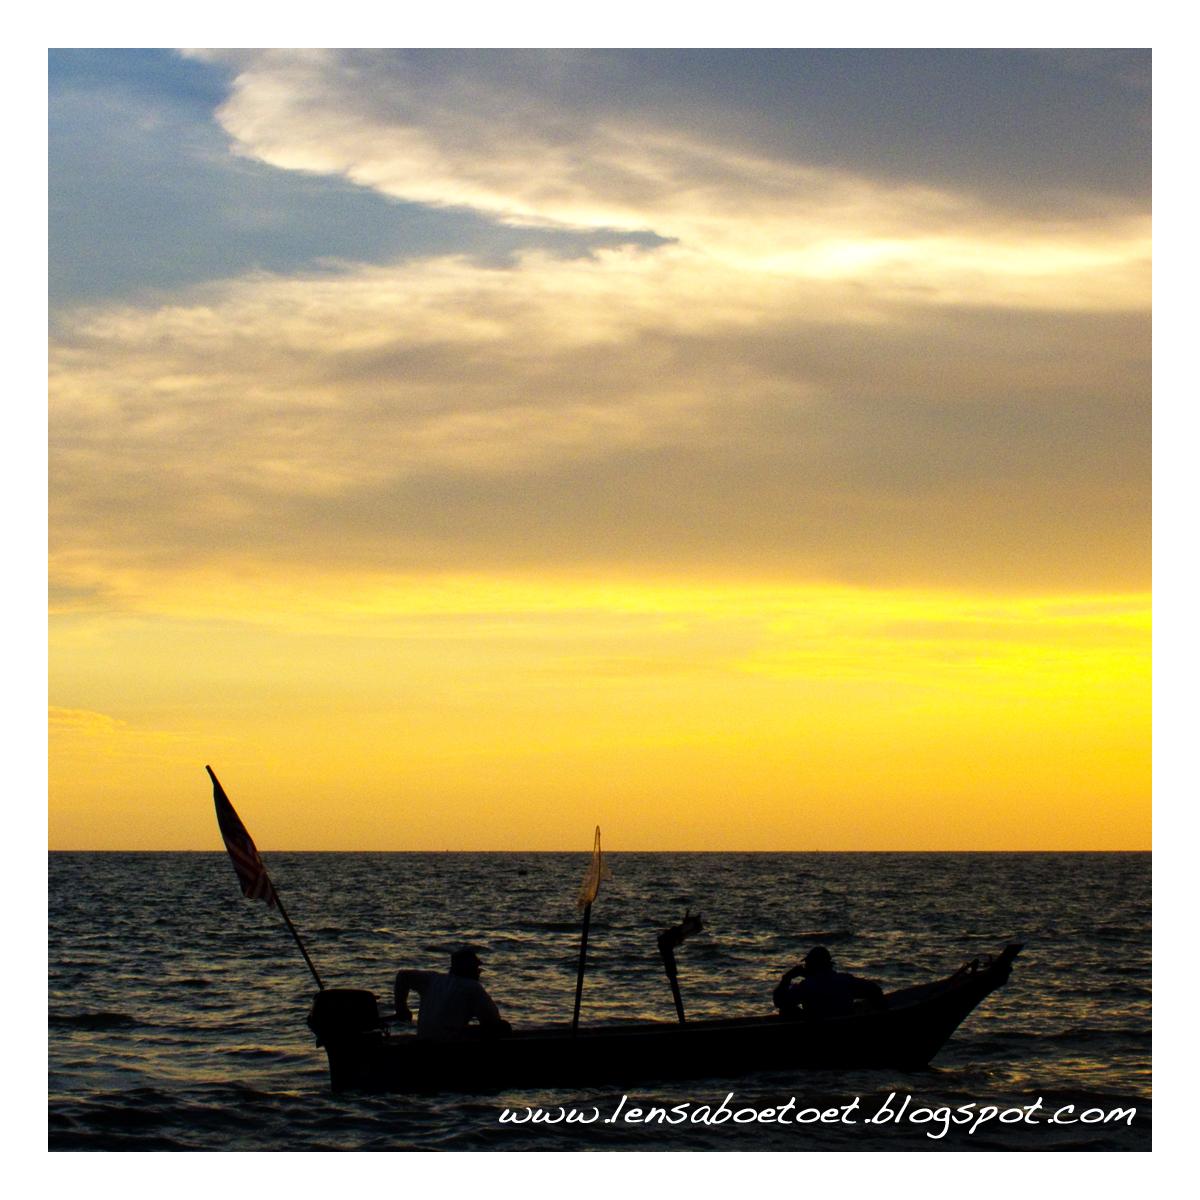 IMG_1070 Of Pantai Kemunting Di Melaka Tempat Menarik Yang Sangat Awesome Untuk Kita Singgah